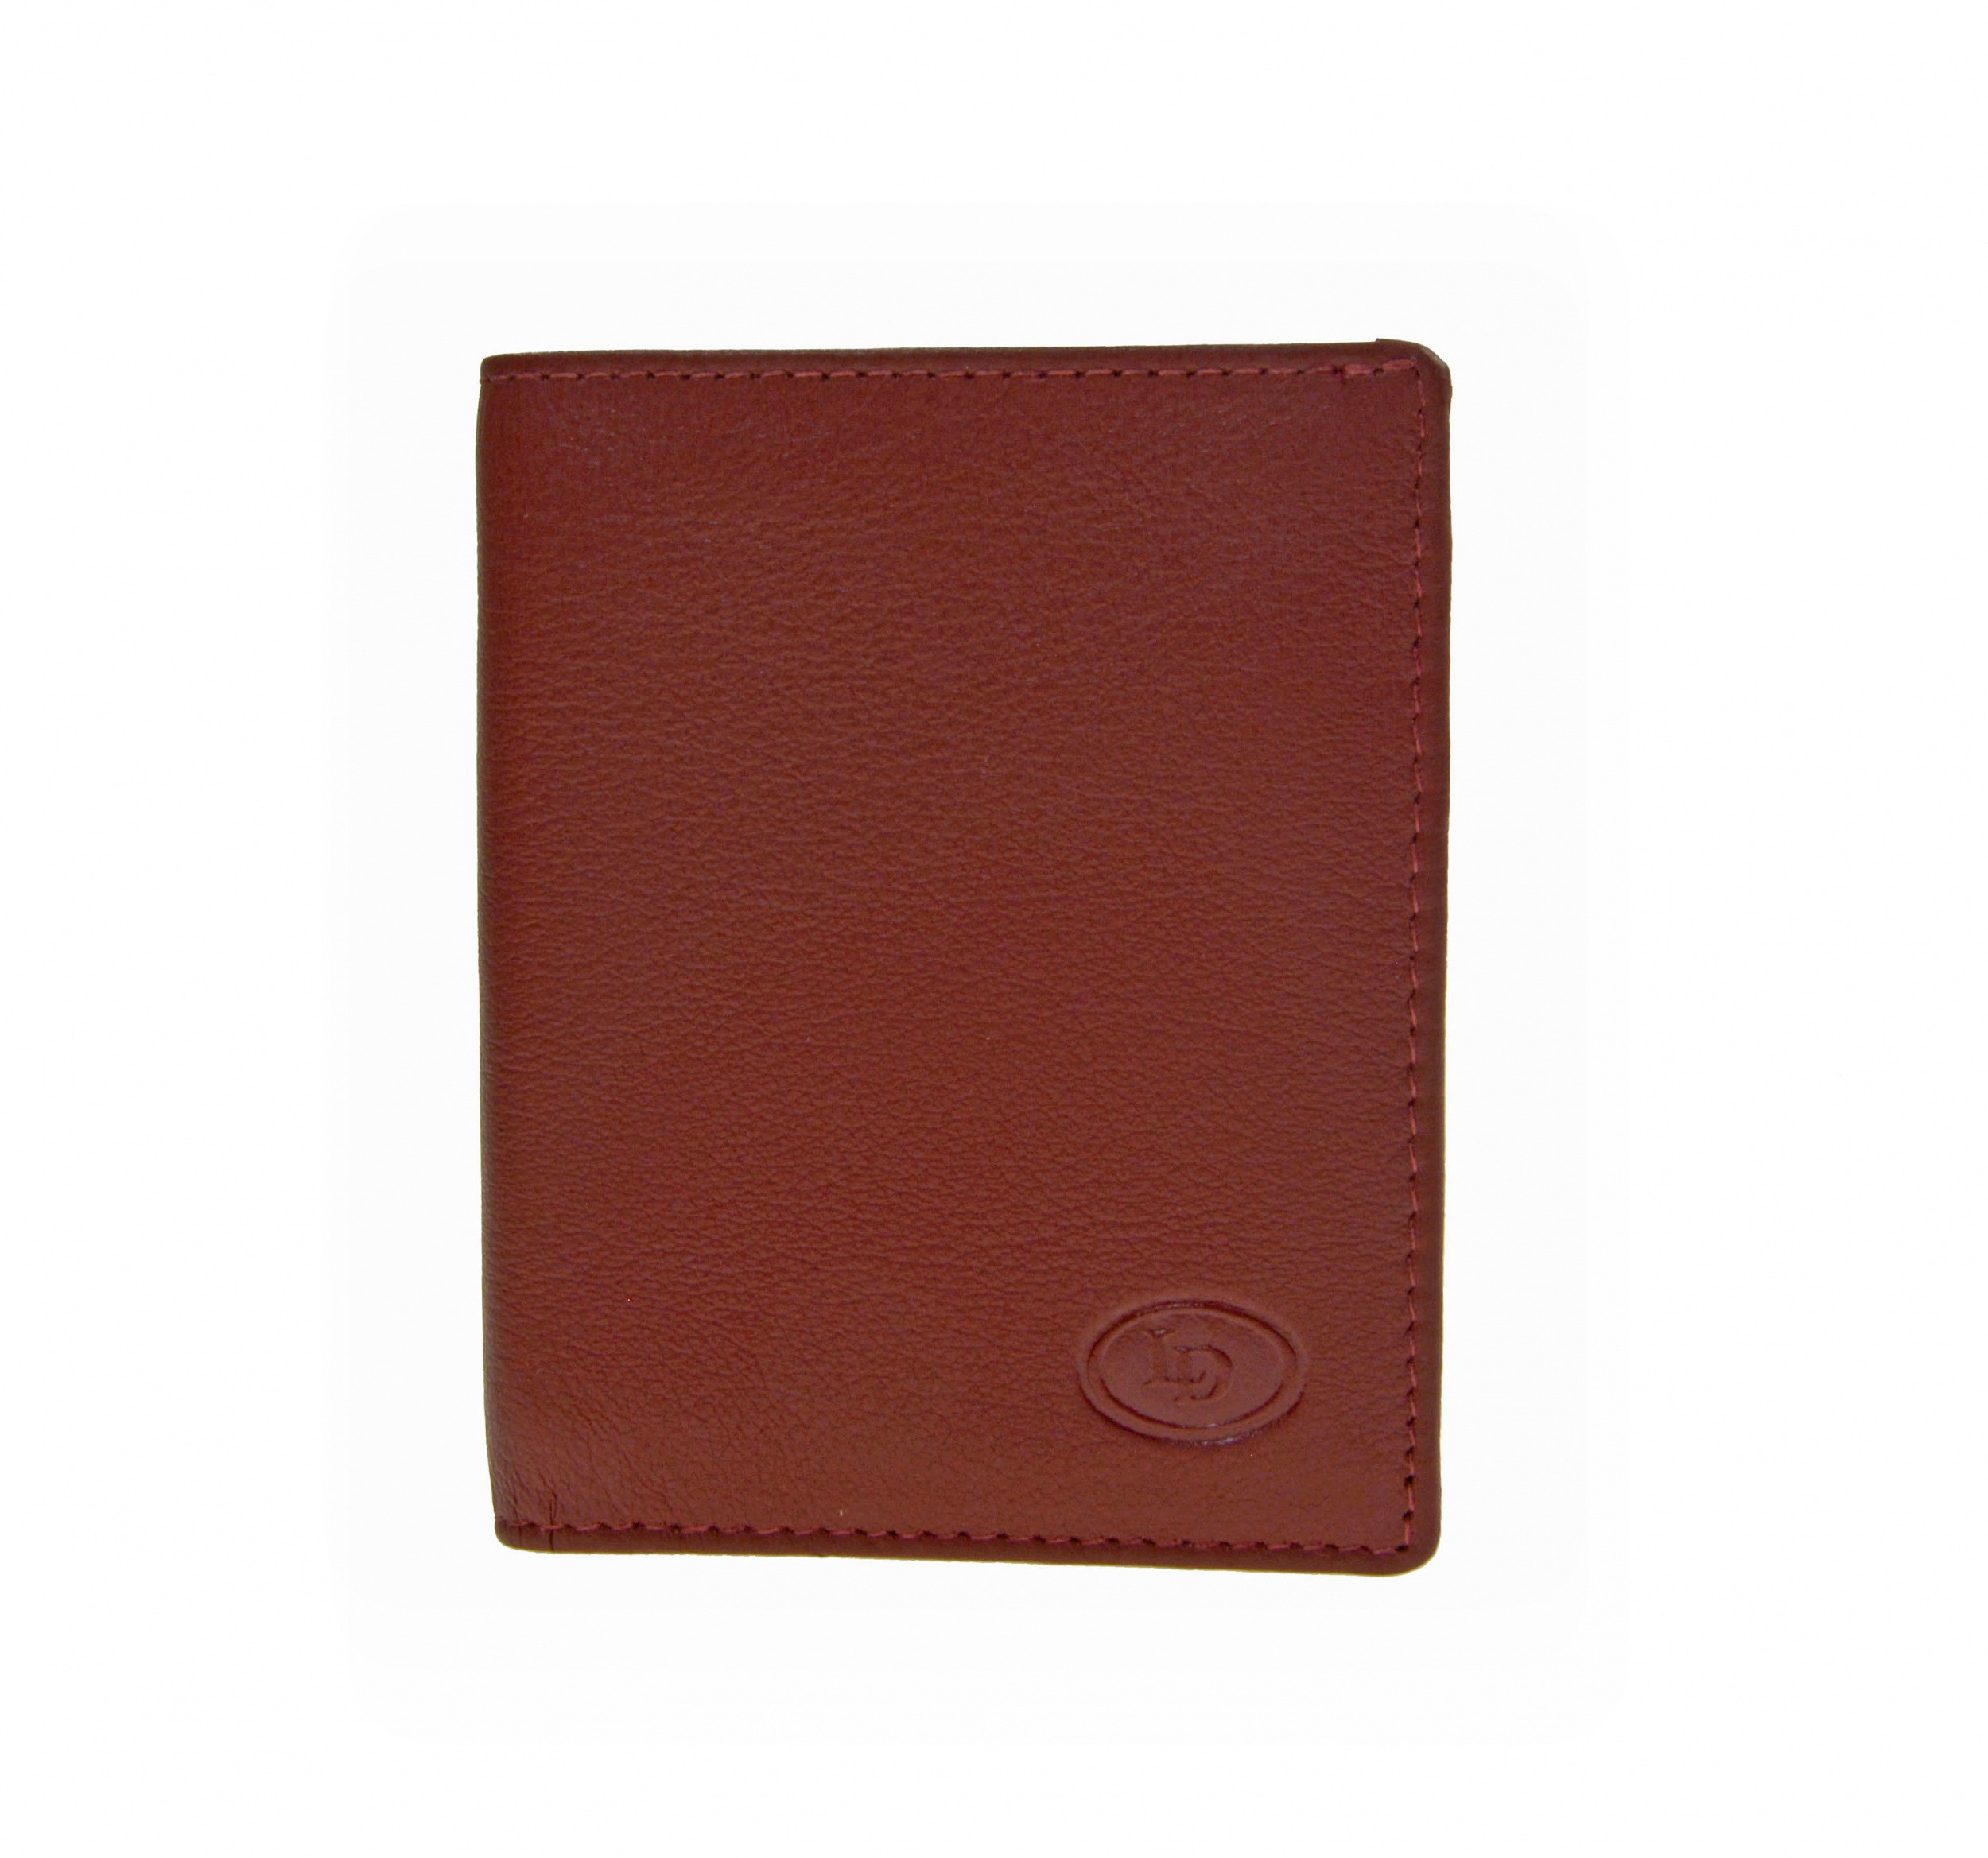 Leather Design Creditcard etui KA 1119 Rood